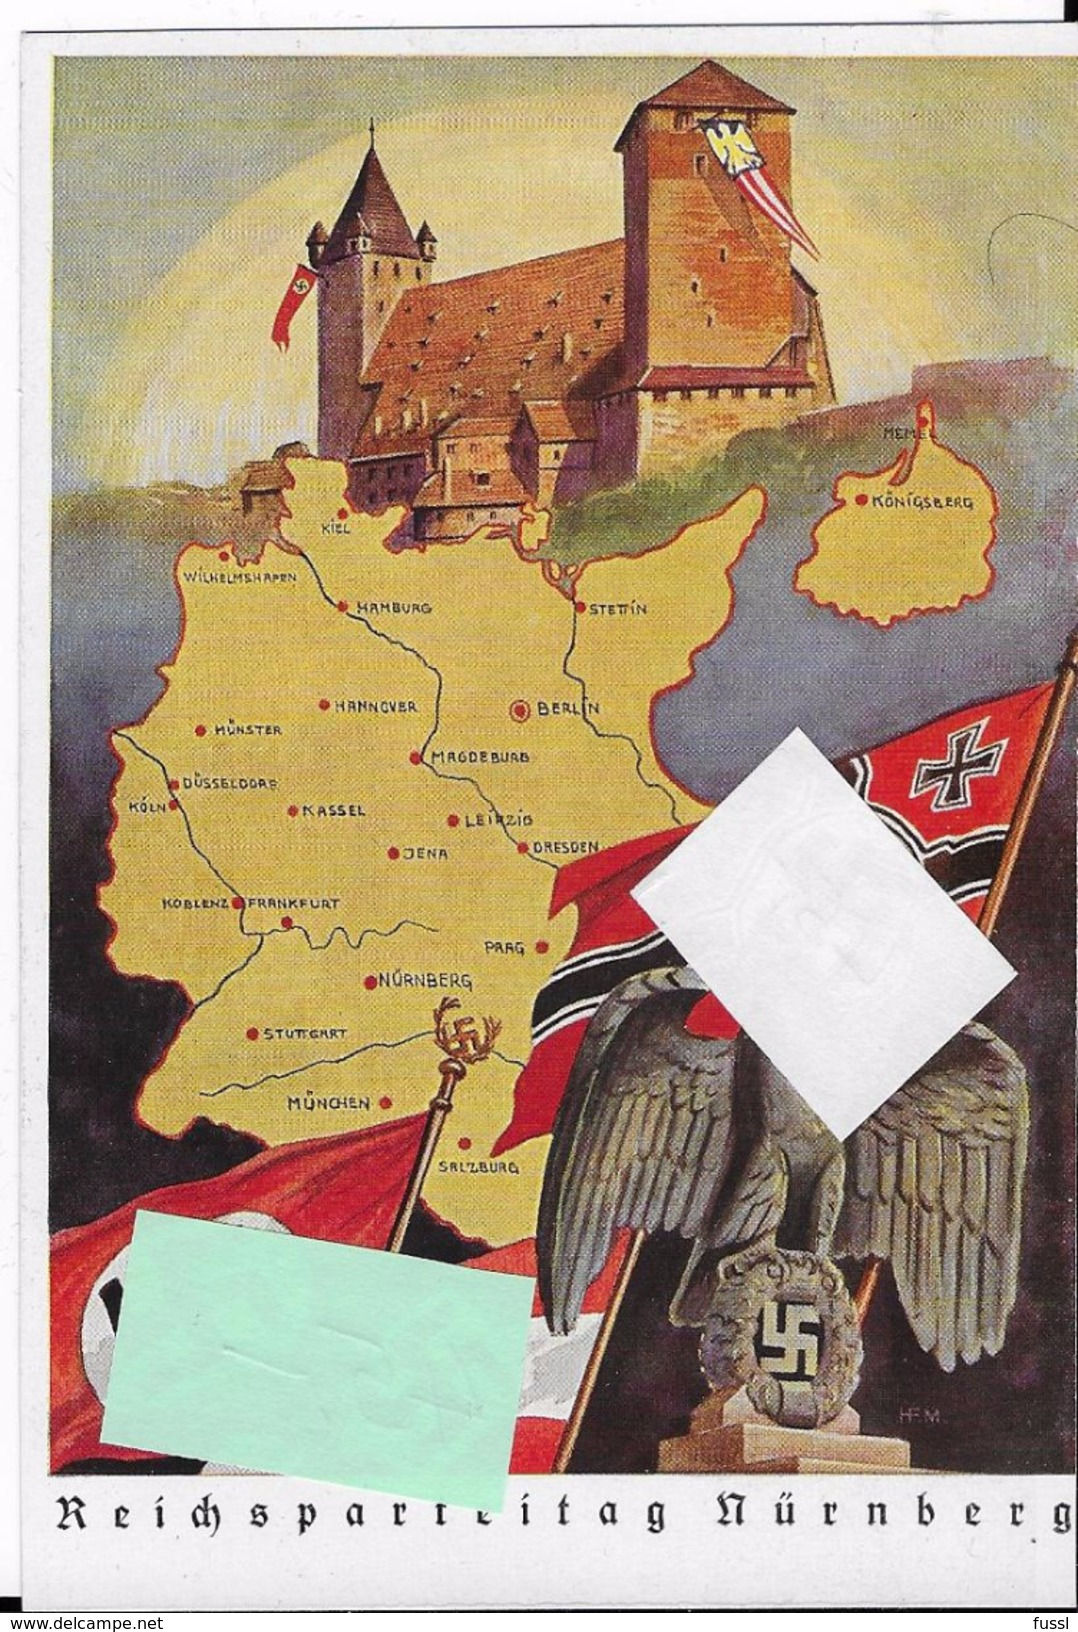 Reichsparteitag Nürnberg, Propaganda, Hakenkreuz - Weltkrieg 1939-45